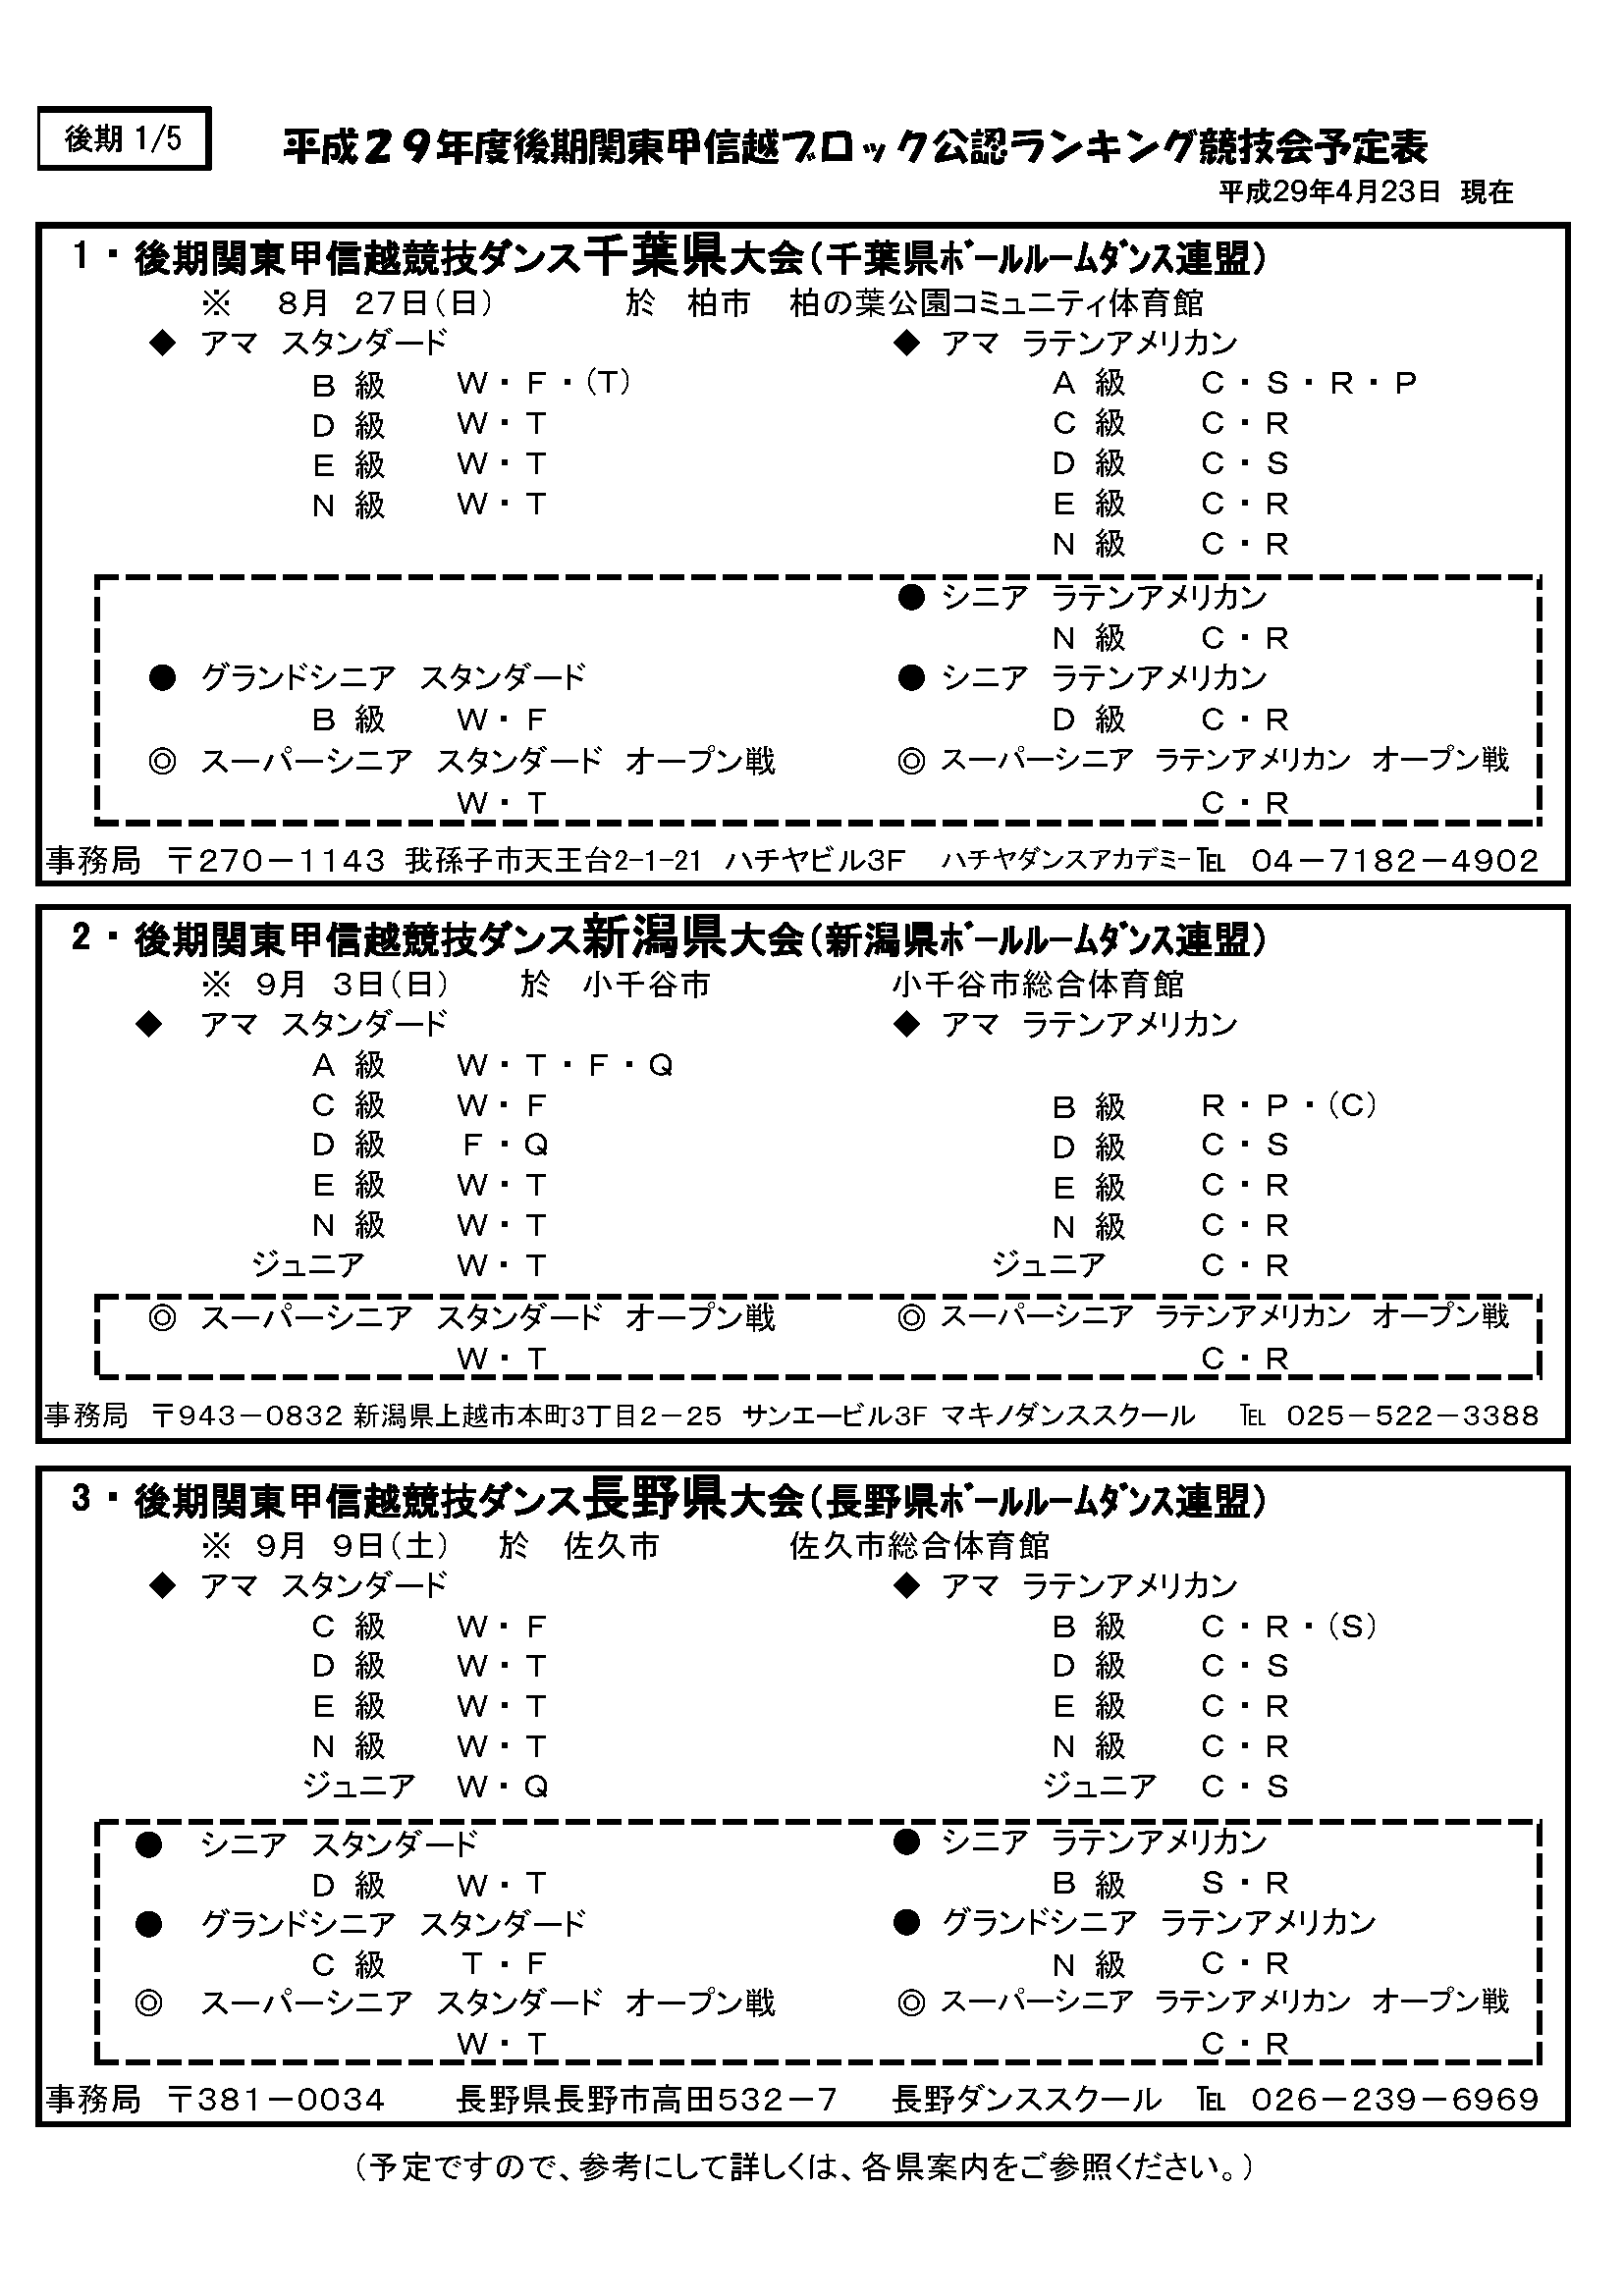 schedule_latter_5_1-min